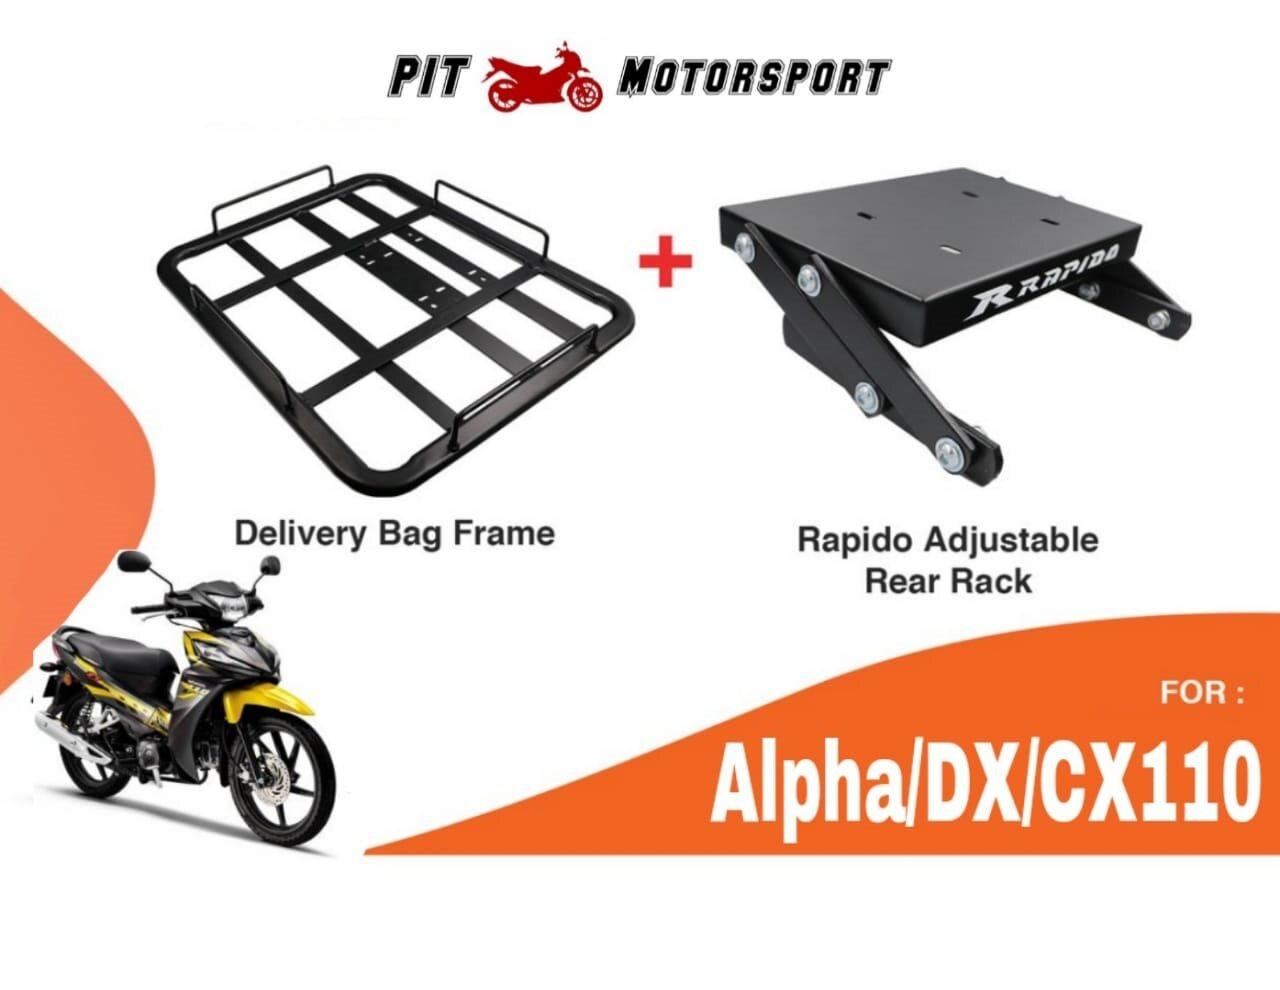 Monorack ALPHA DX110 CX110 RAPIDO Foodpanda Grabfood Heavy Duty With Delivery Bag Frame Tapak Monorack Food panda Grab Honda CX DX